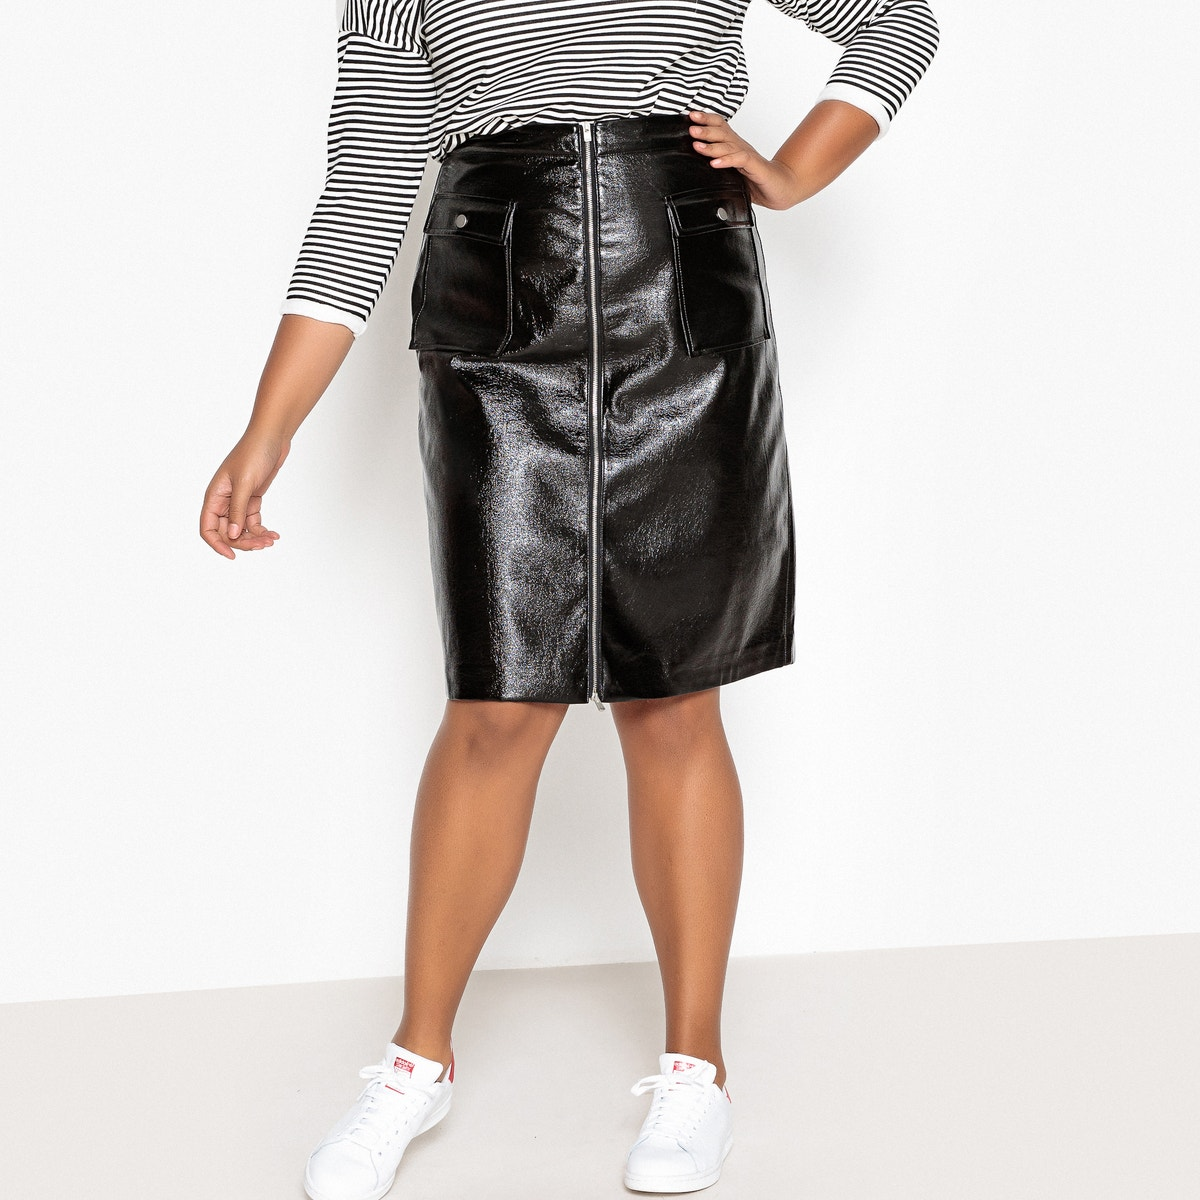 Midi φούστα σε απομίμηση δέρματος για μεγάλα μεγέθη γυναικα   φούστες   maxi